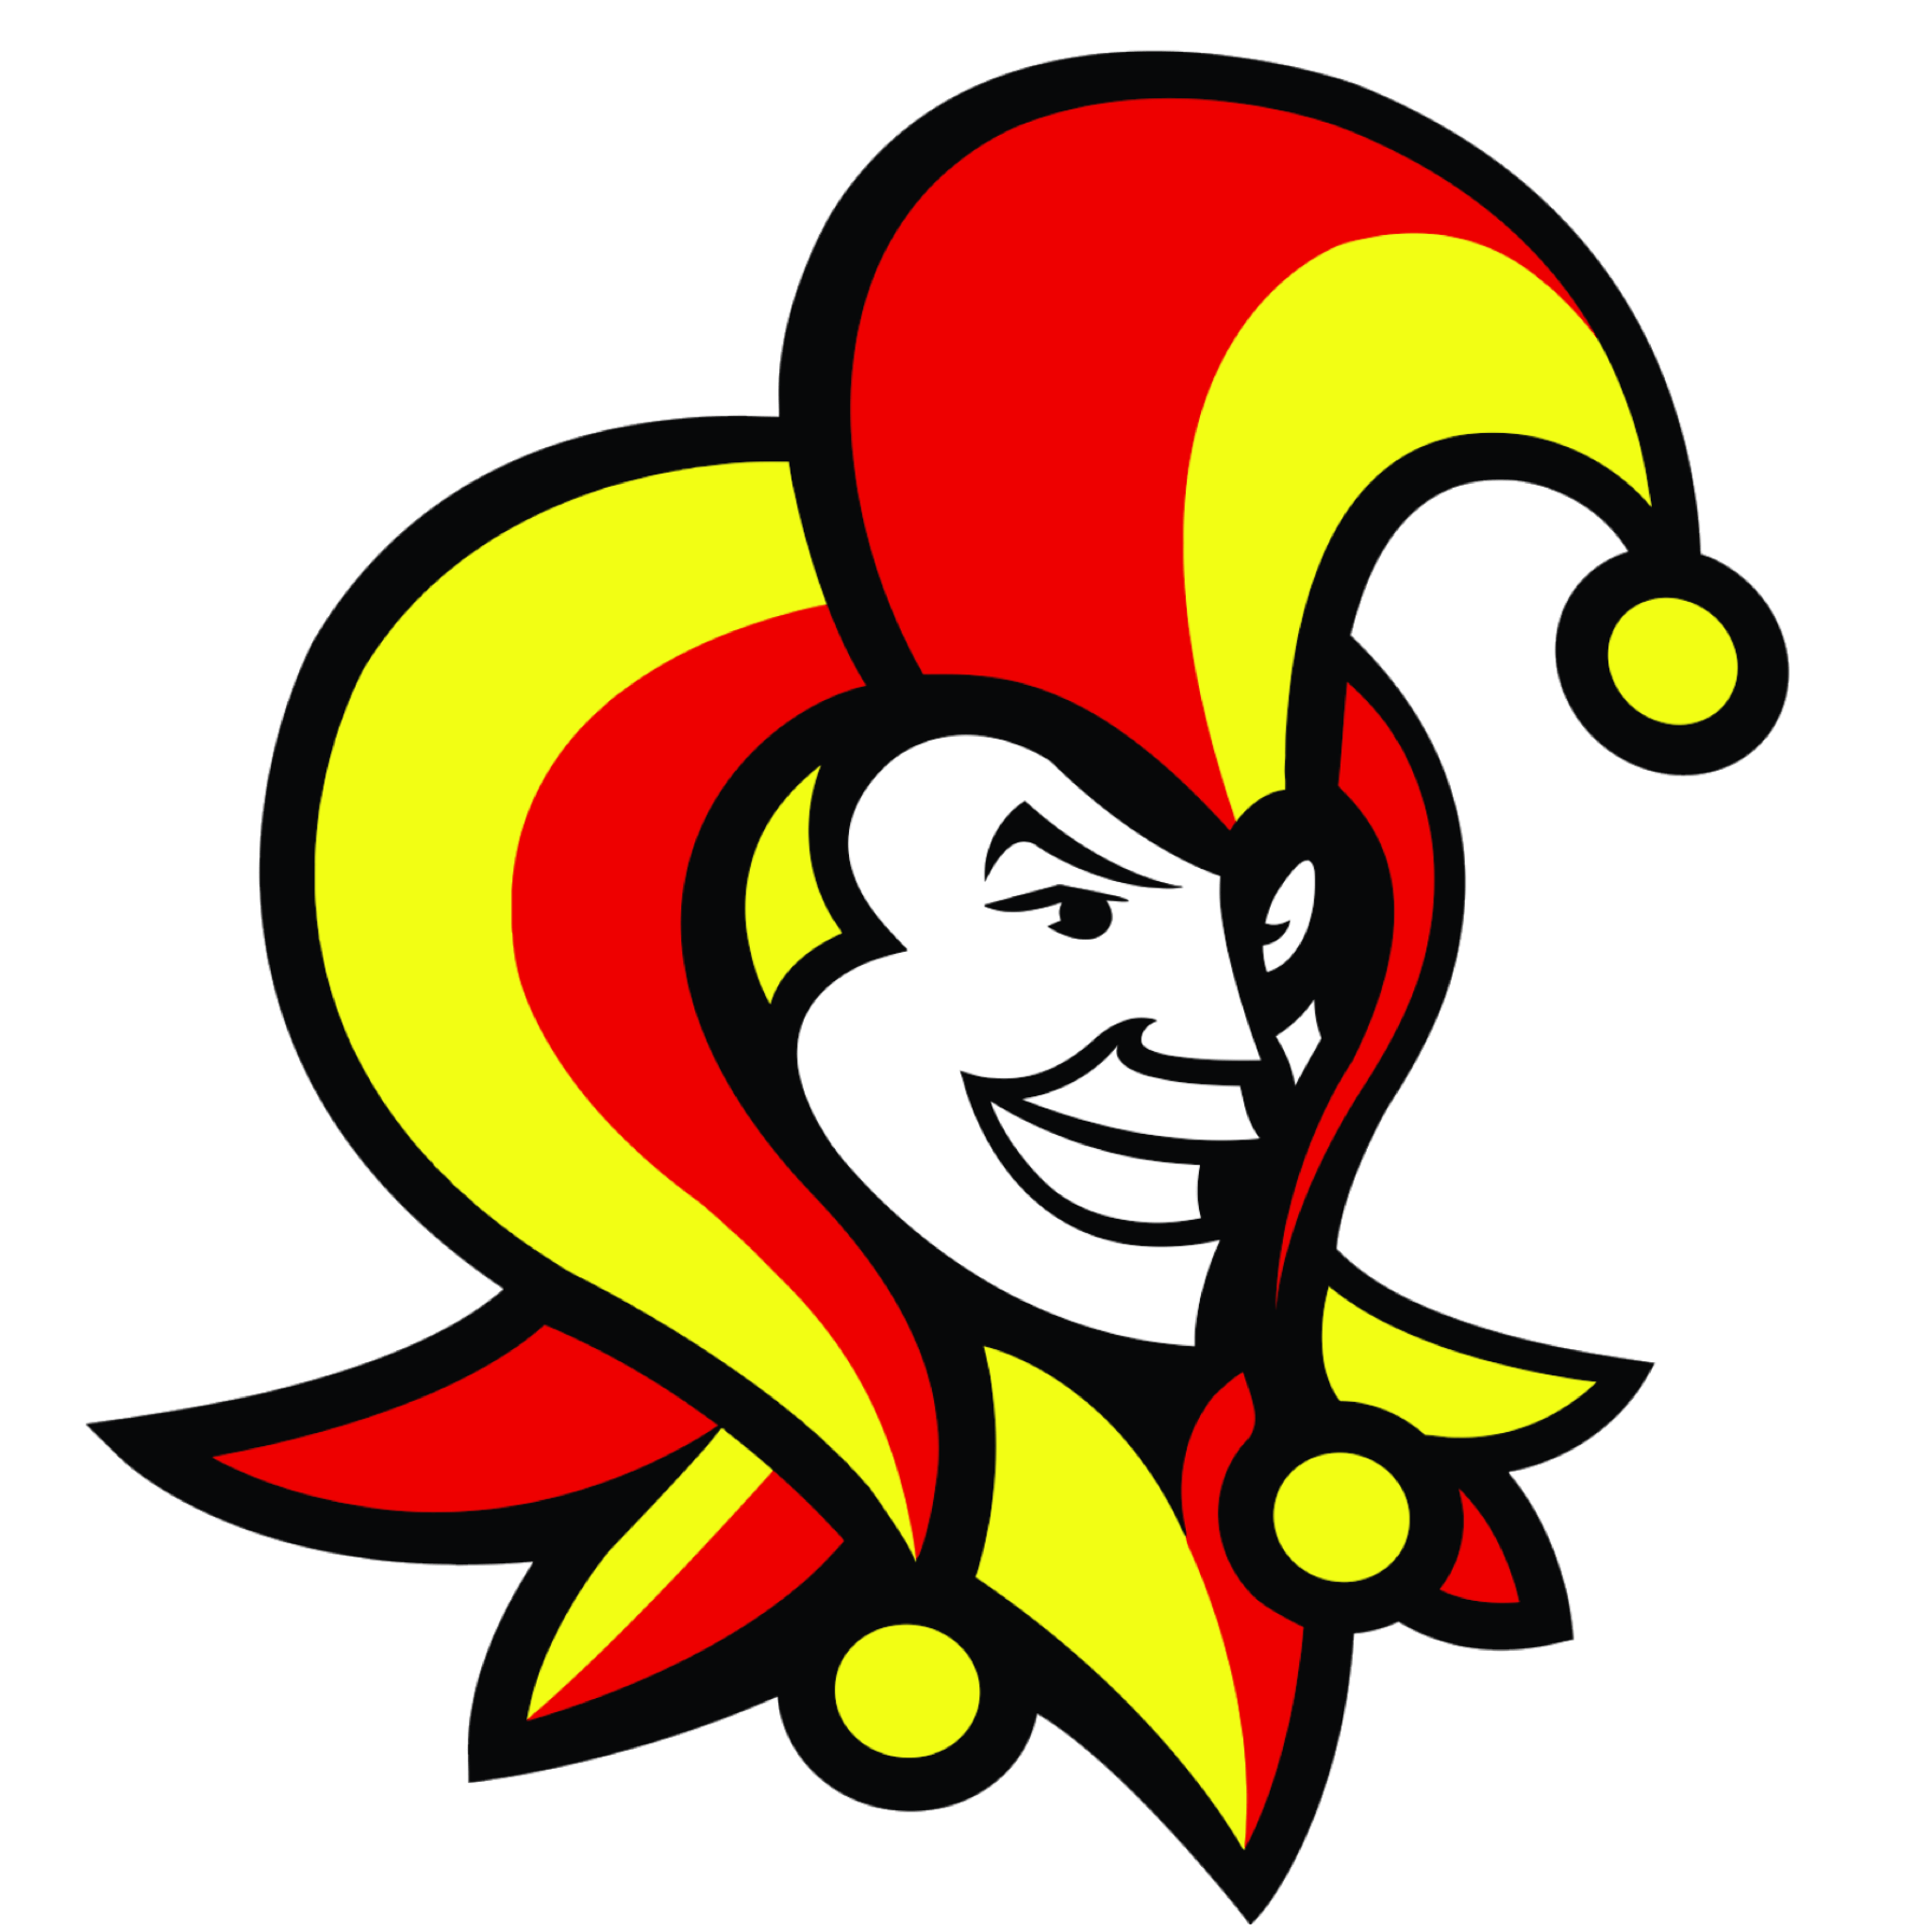 Jokeritsalibandy Helsinki Ry urheiluseuran logo